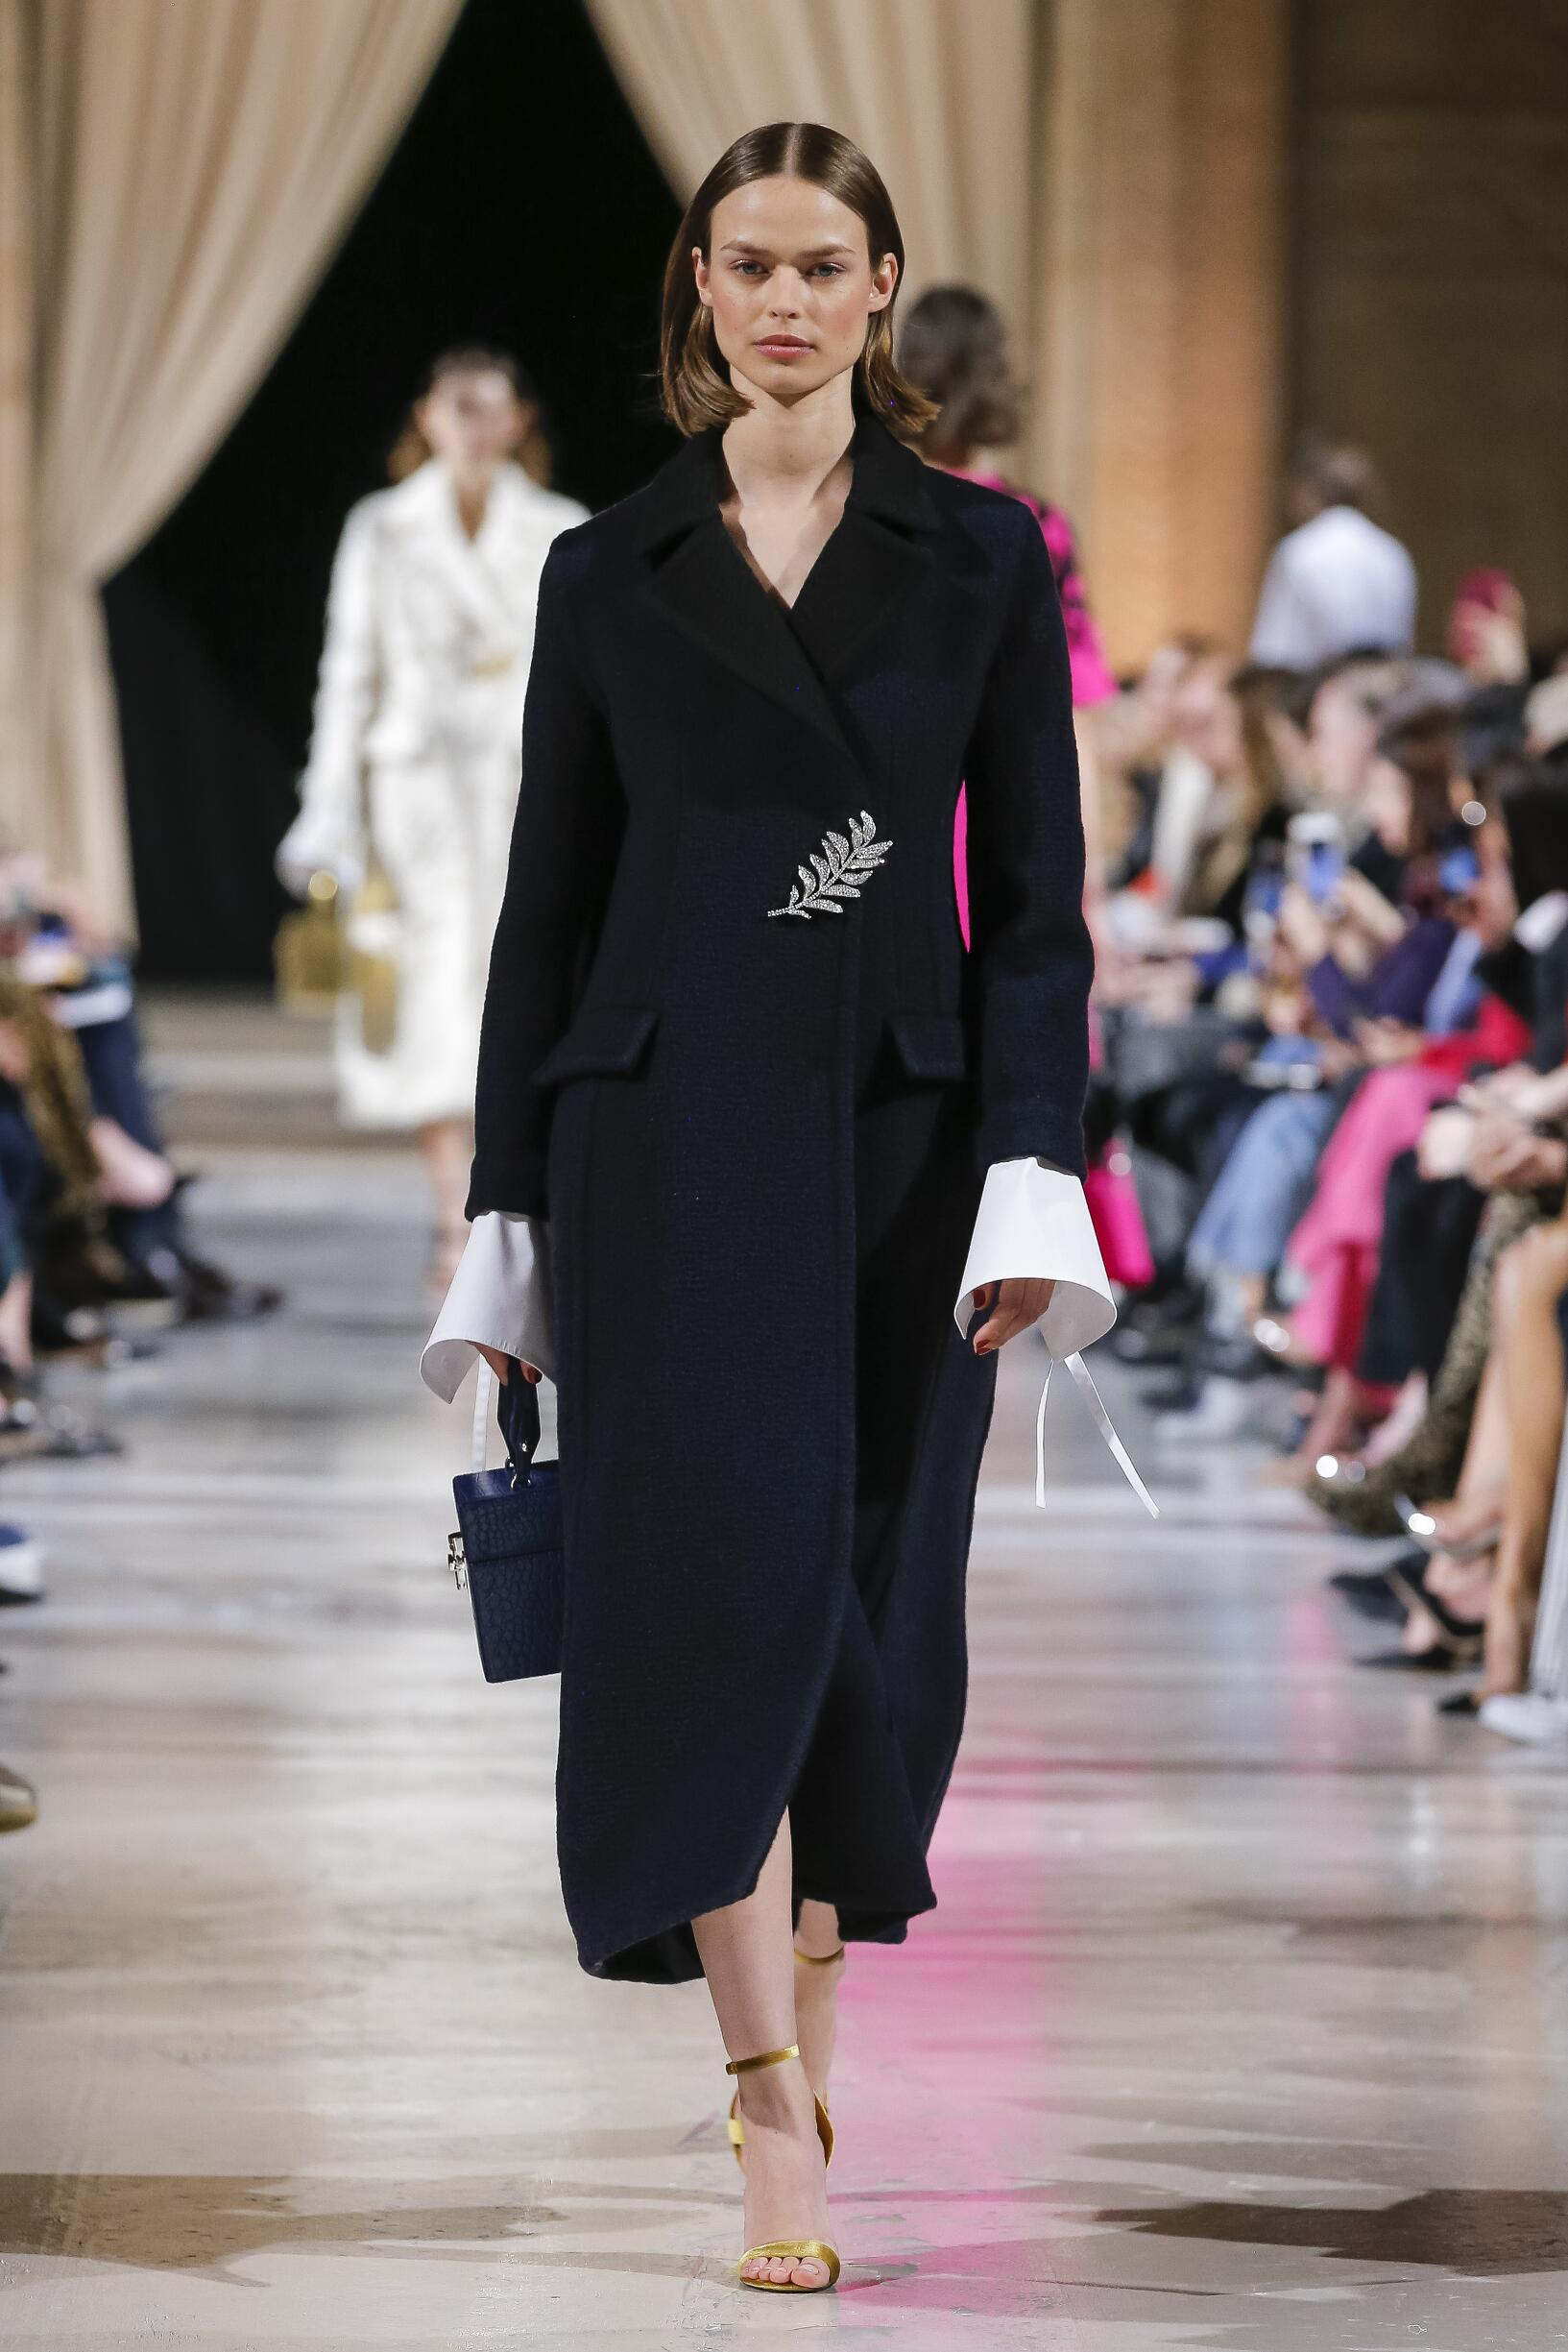 Oscar de la Renta Woman Style 2018